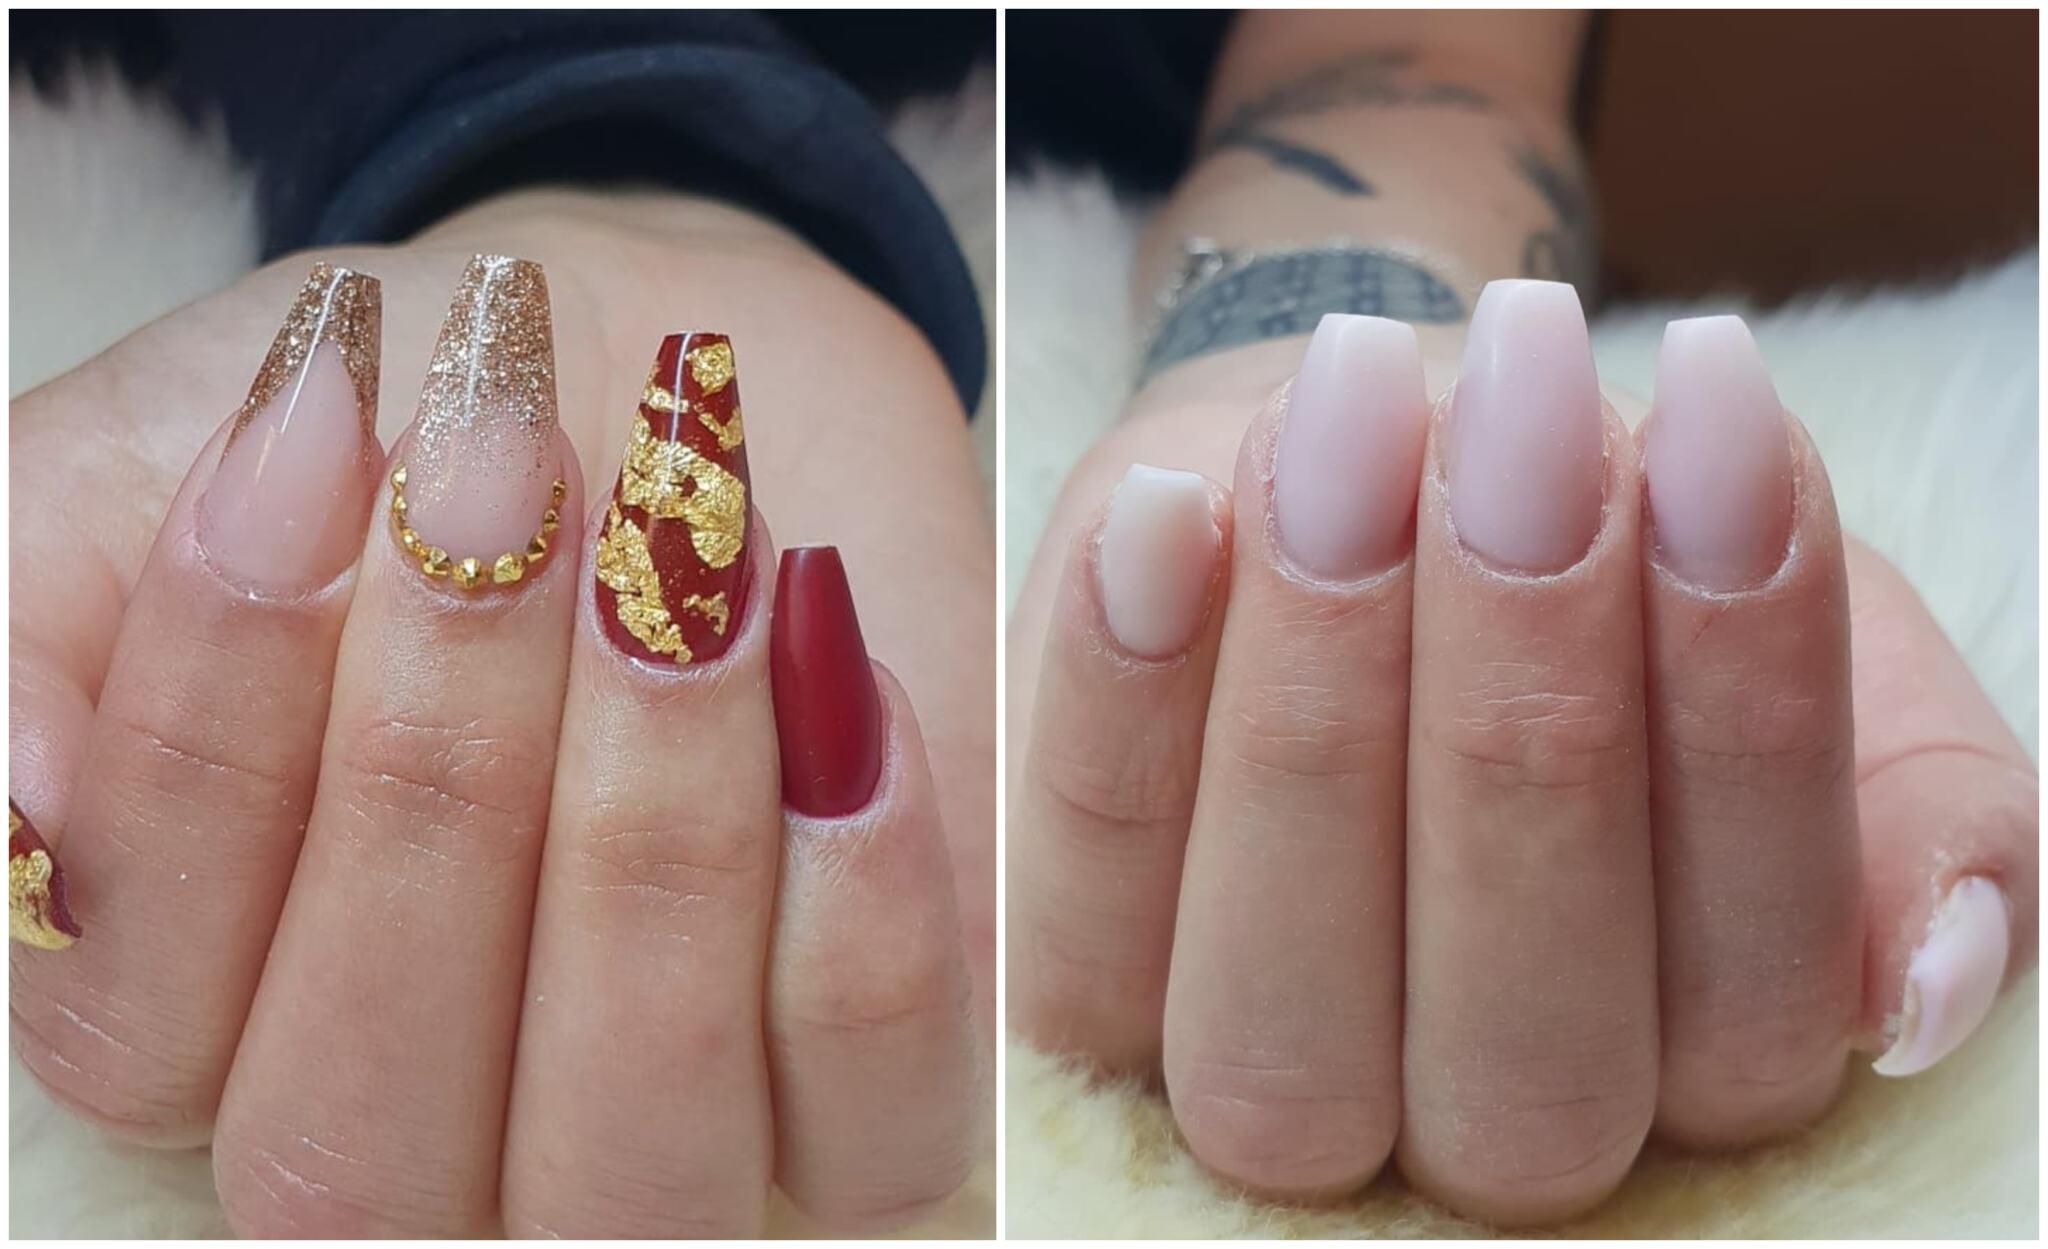 sjukdomar som drabbar naglar